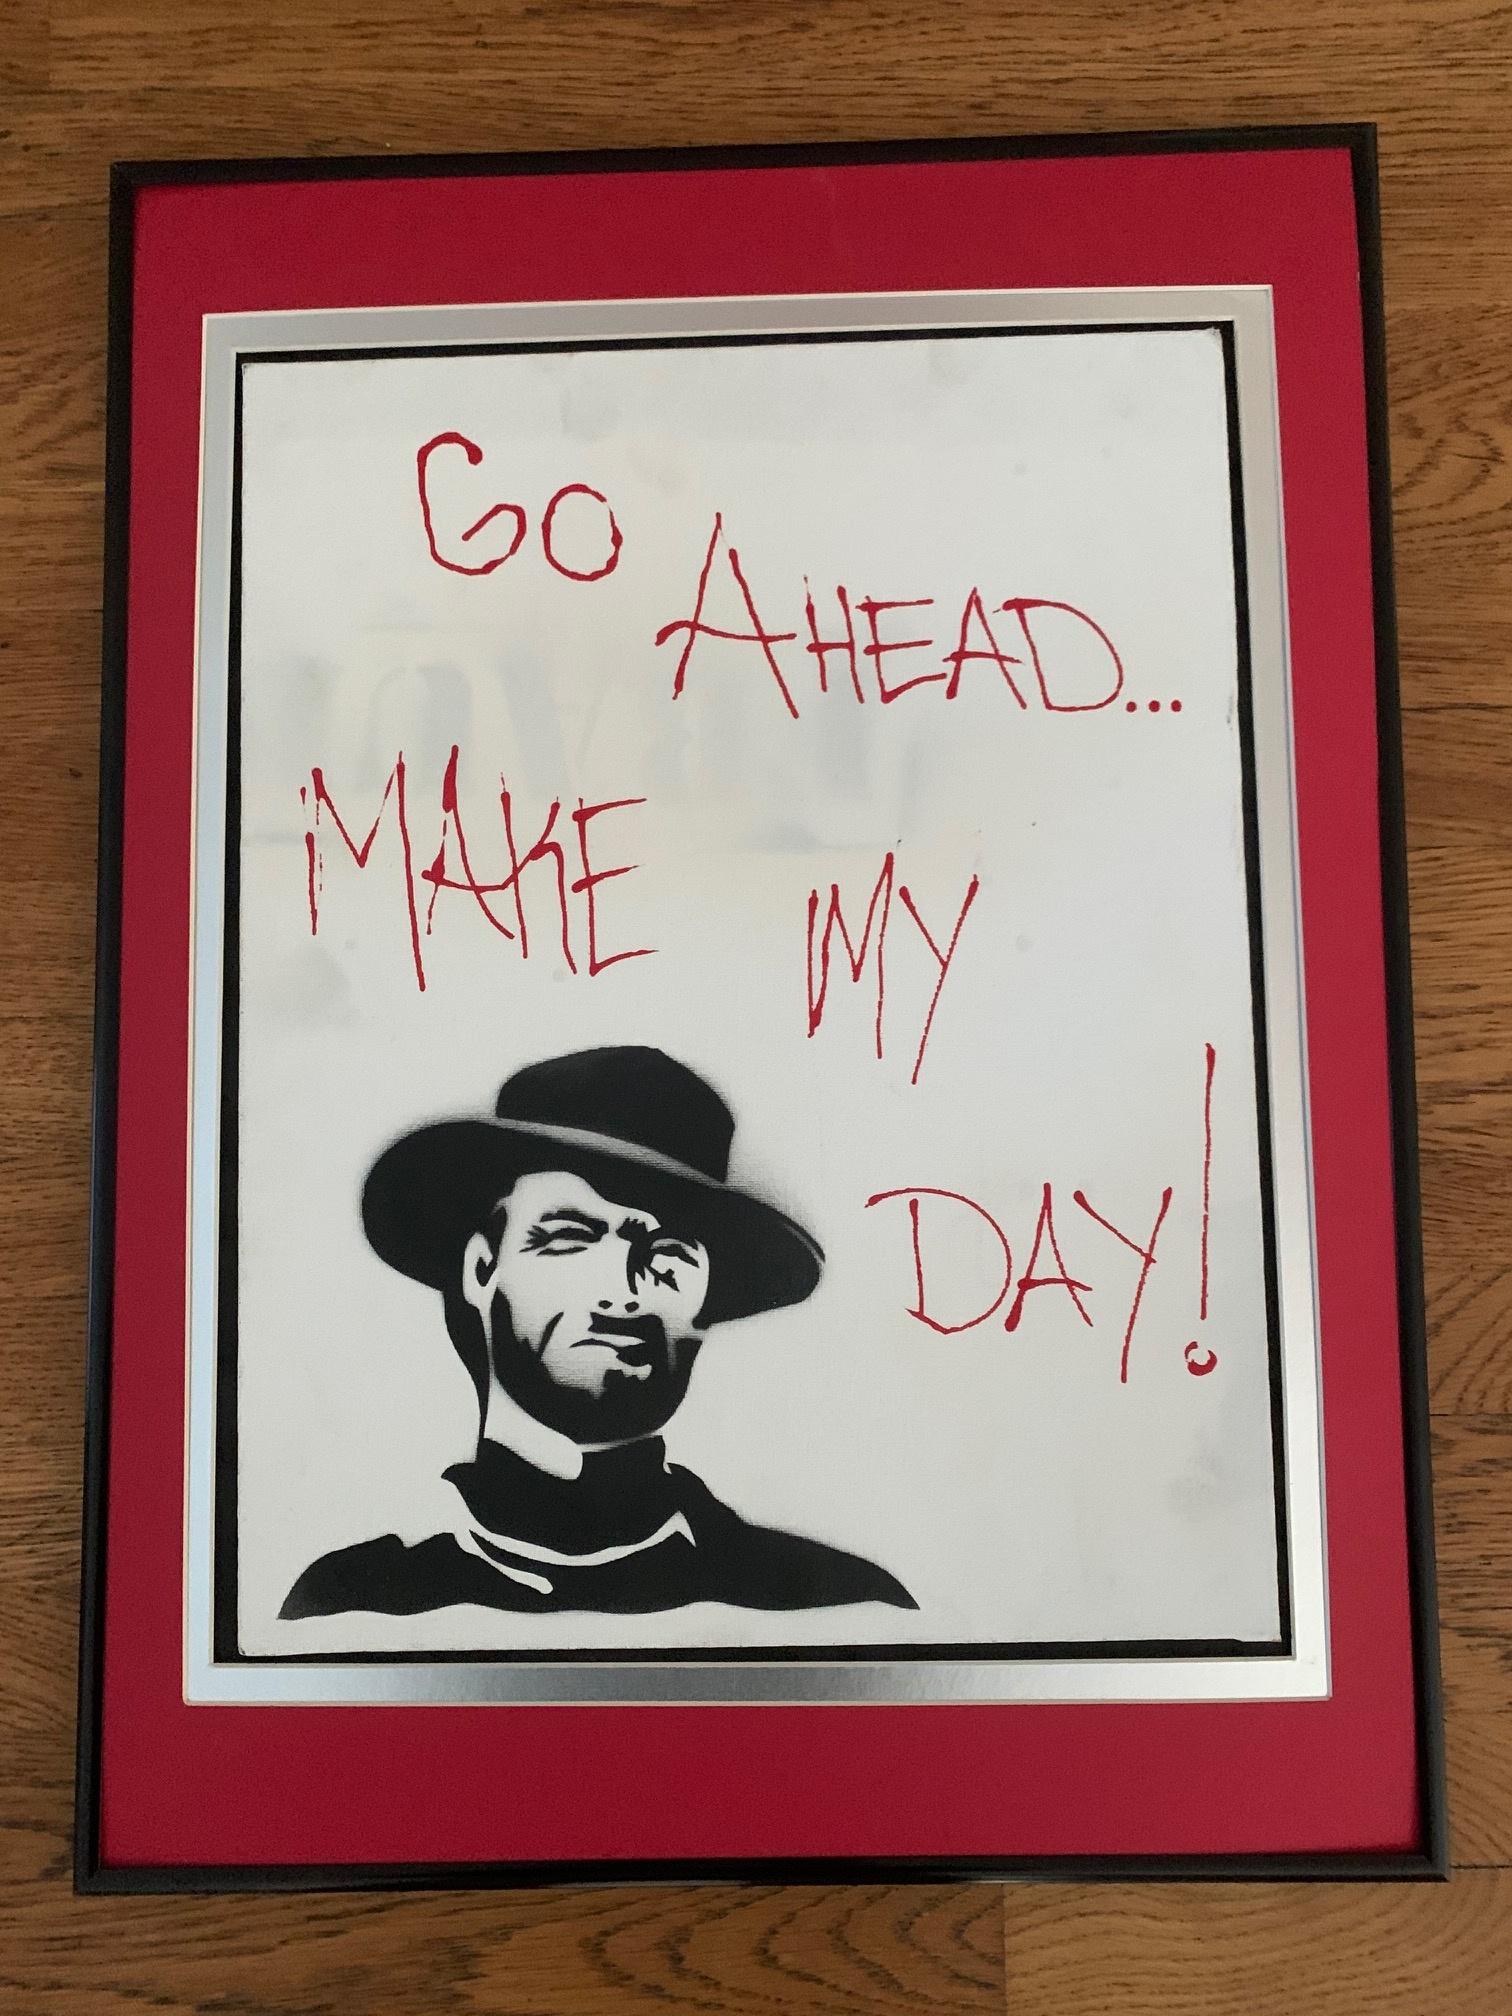 Go Ahead...Make My Da... by  Spencer Guilburt MAR - Masterpiece Online